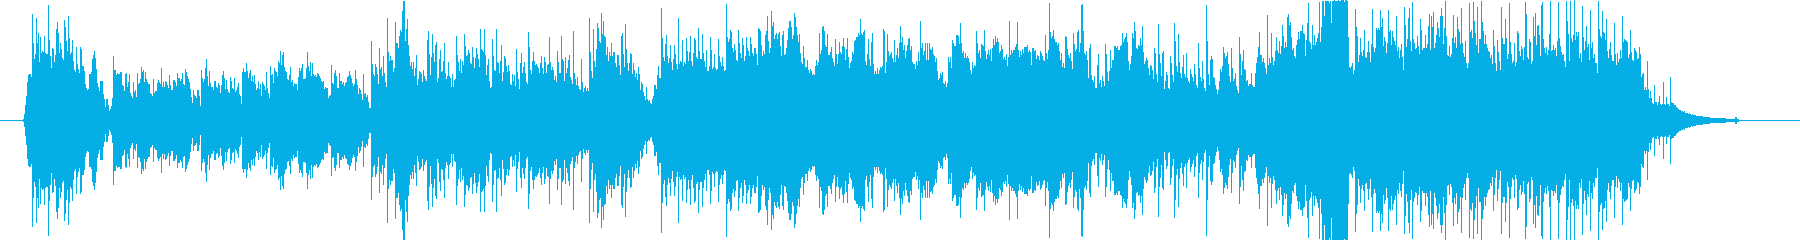 Theme(「幸色のワンルーム」背景音楽)の再生済みの波形